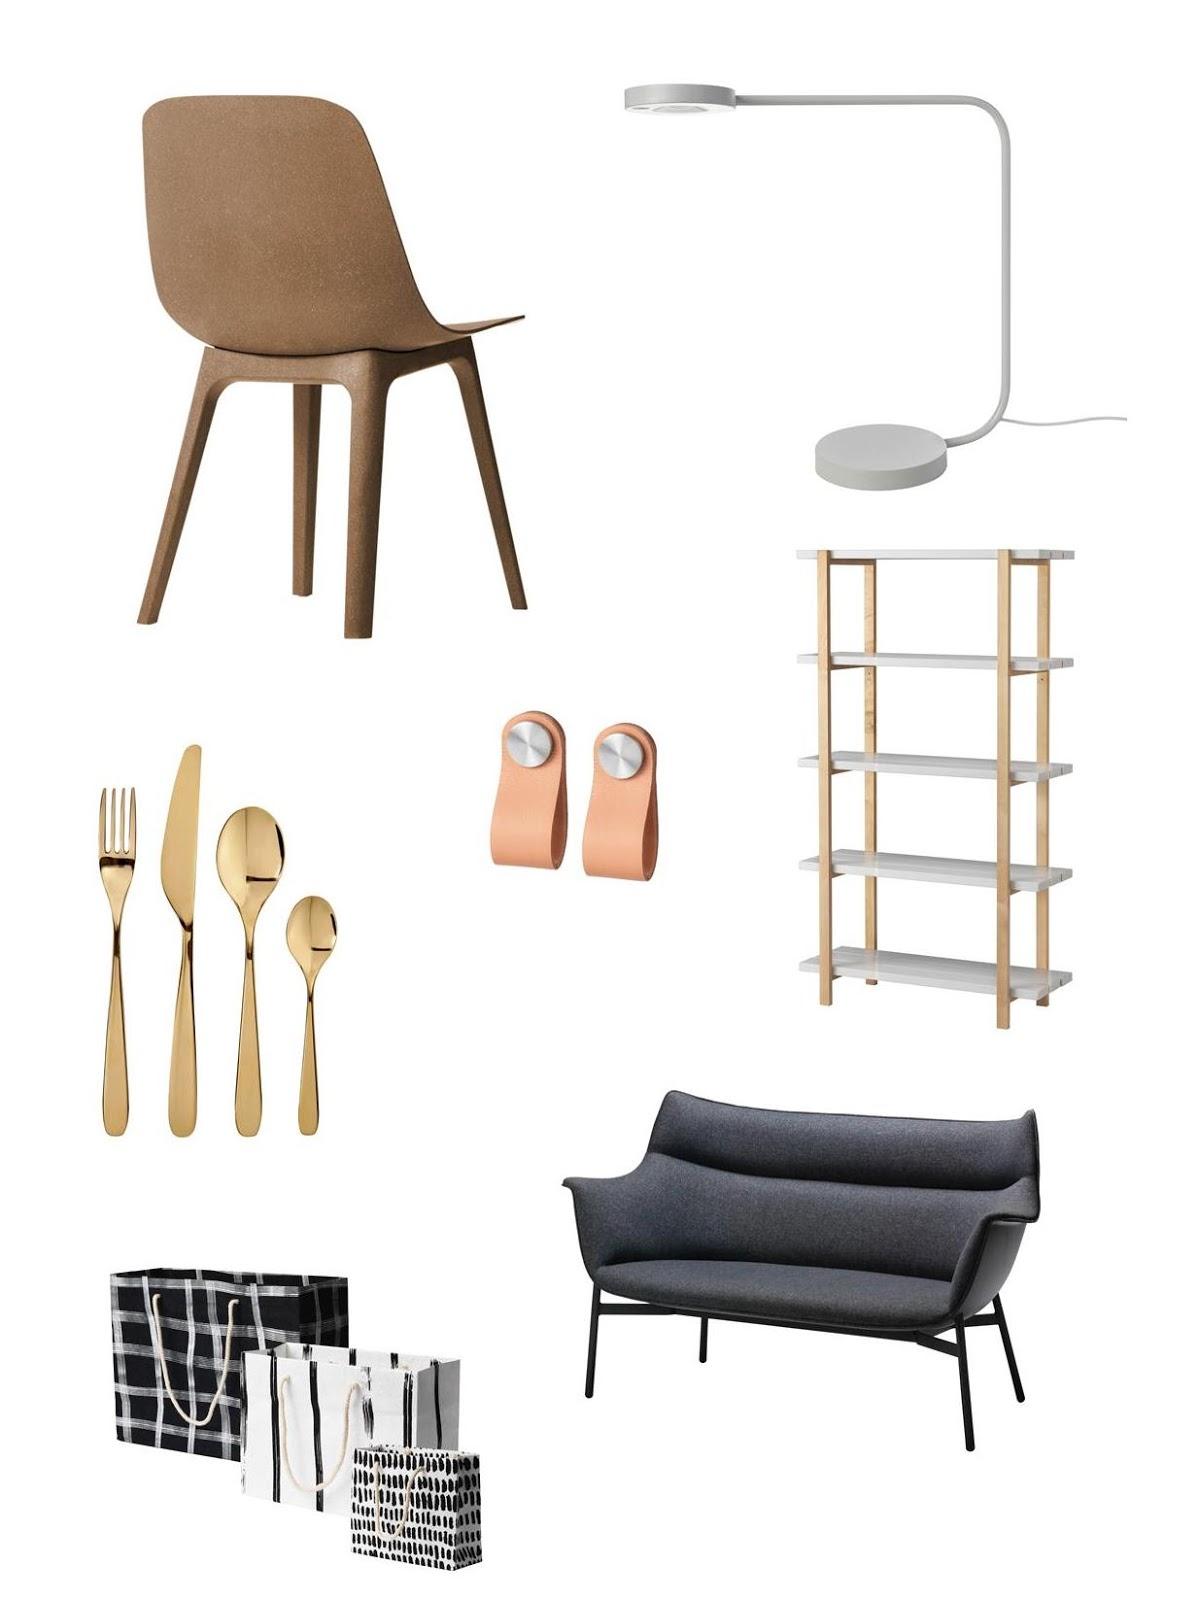 IKEA Catalogue 2018 - Make Room for Life | Home & Art Magazine